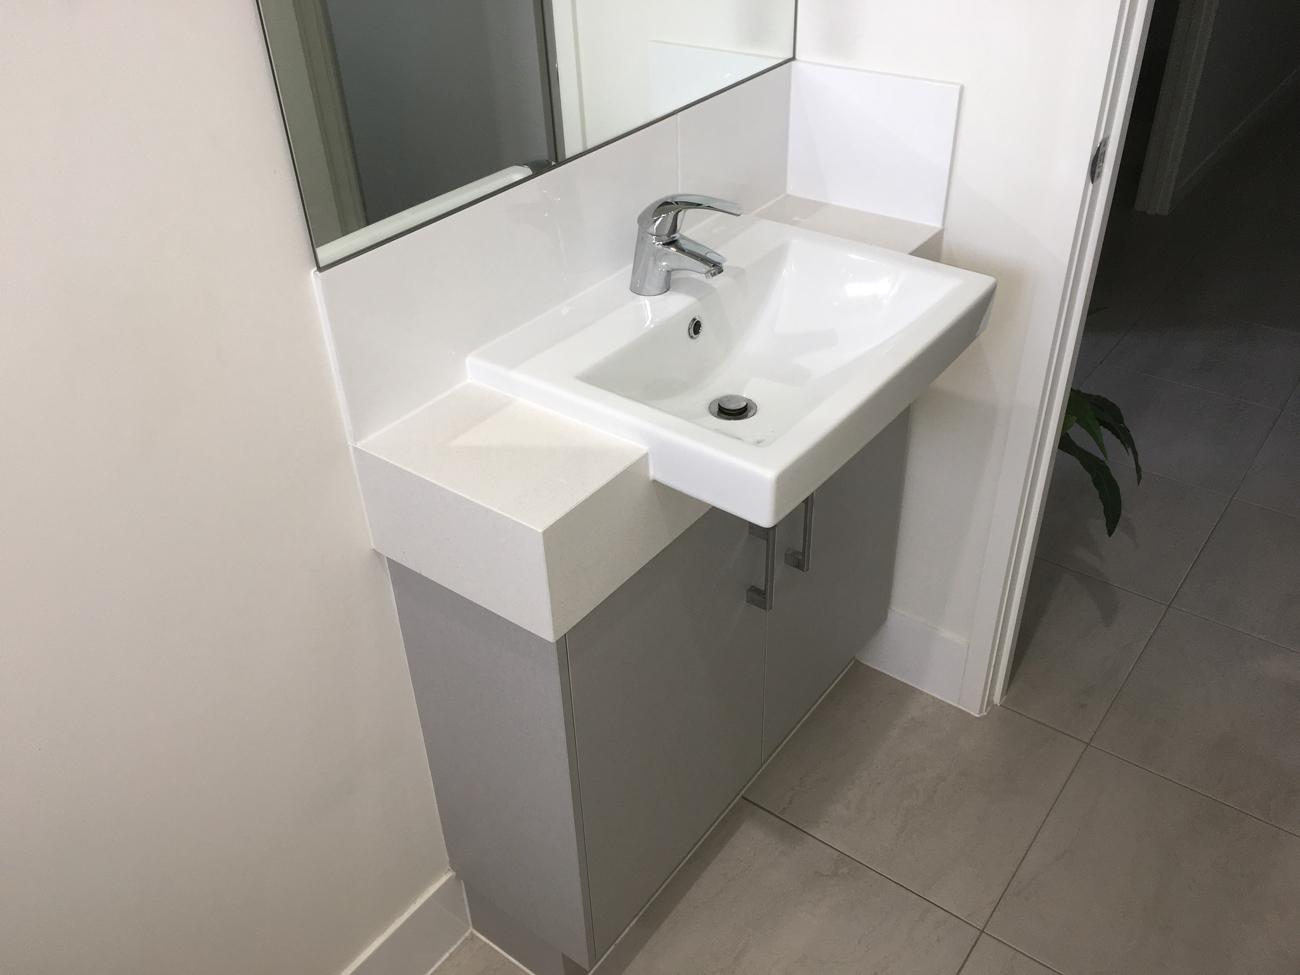 Toilet, Bath, Vanity Basin And Shower Installations